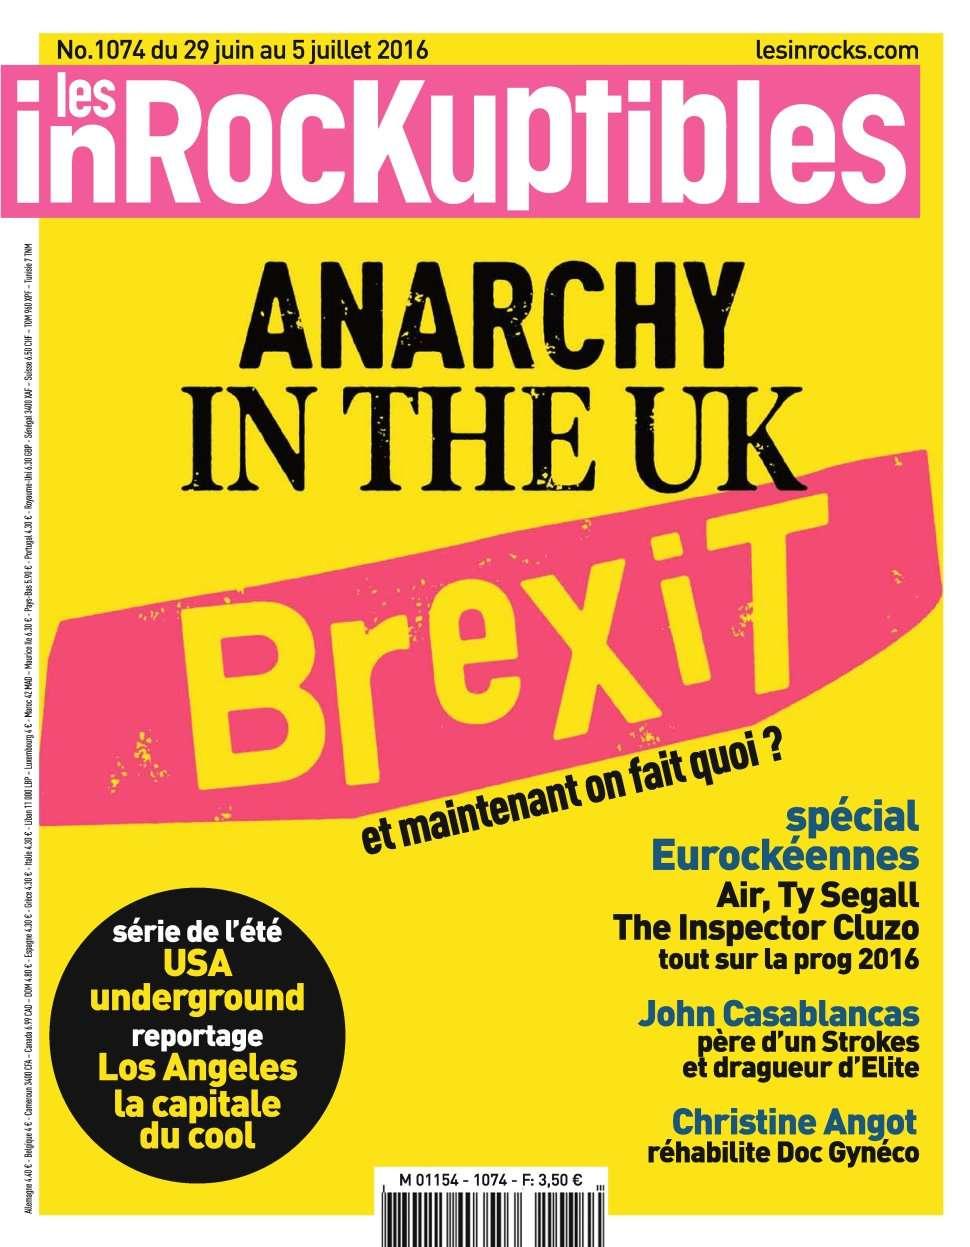 Les Inrockuptibles 1074 - 29 Juin au 5 Juillet 2016